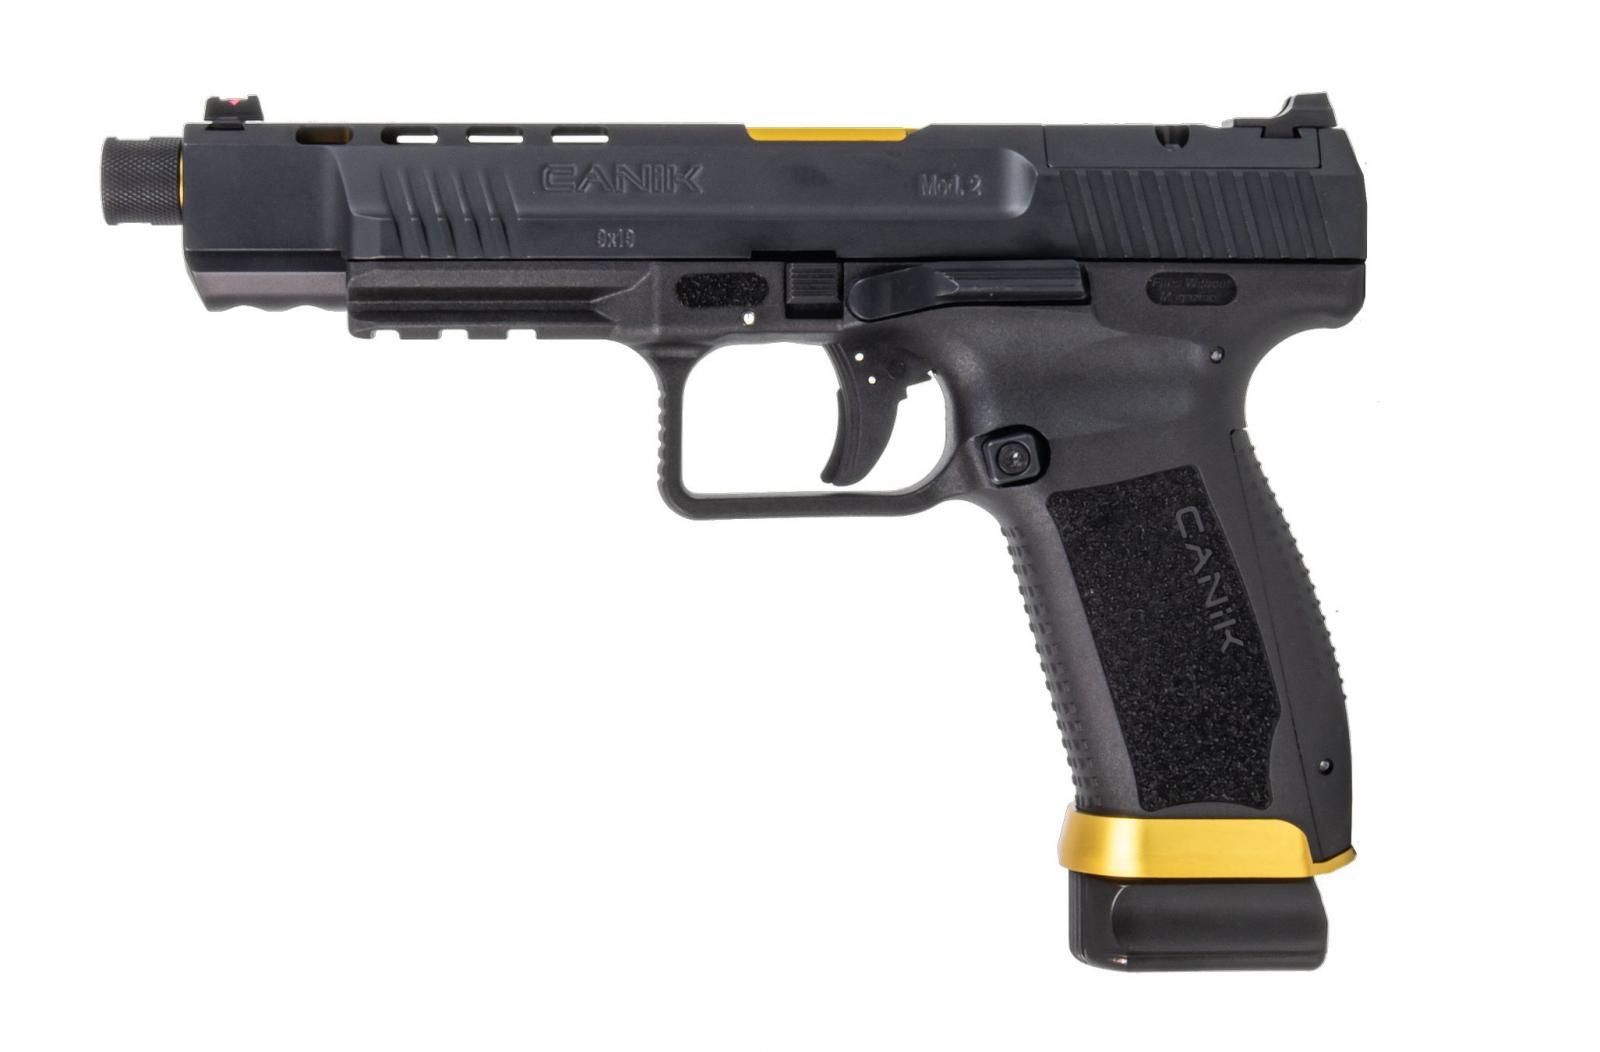 P.S.A. CANIK TP9 SFX MOD2 CUSTOM BLACK/GOLD Cal 9x19